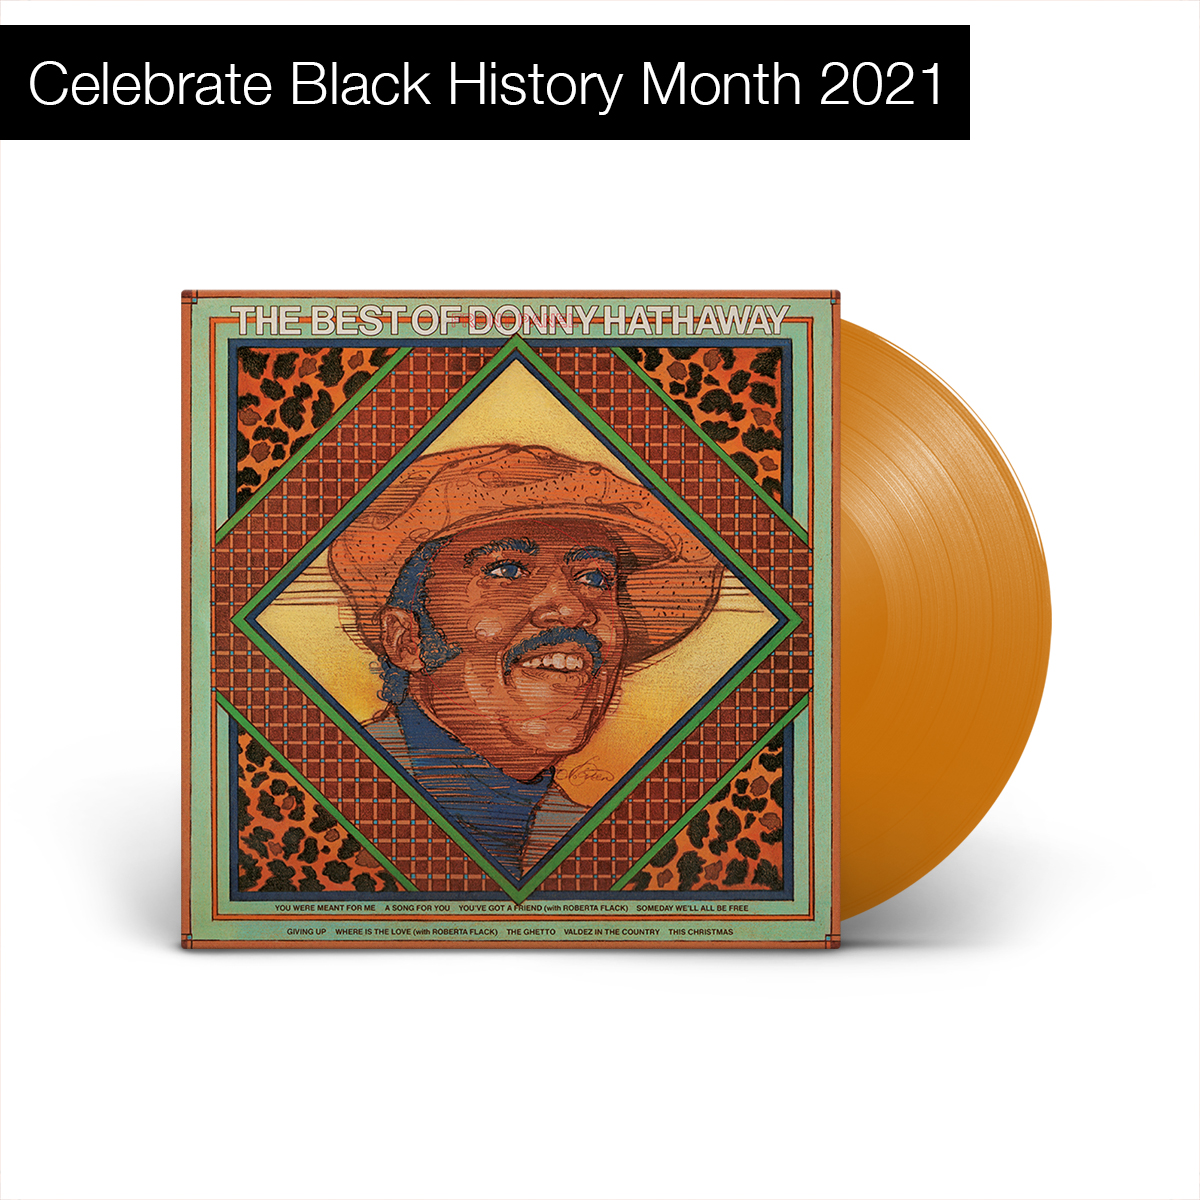 Donny Hathaway - The Best Of Donny Hathaway (180 Gram Translucent Gold Vinyl)